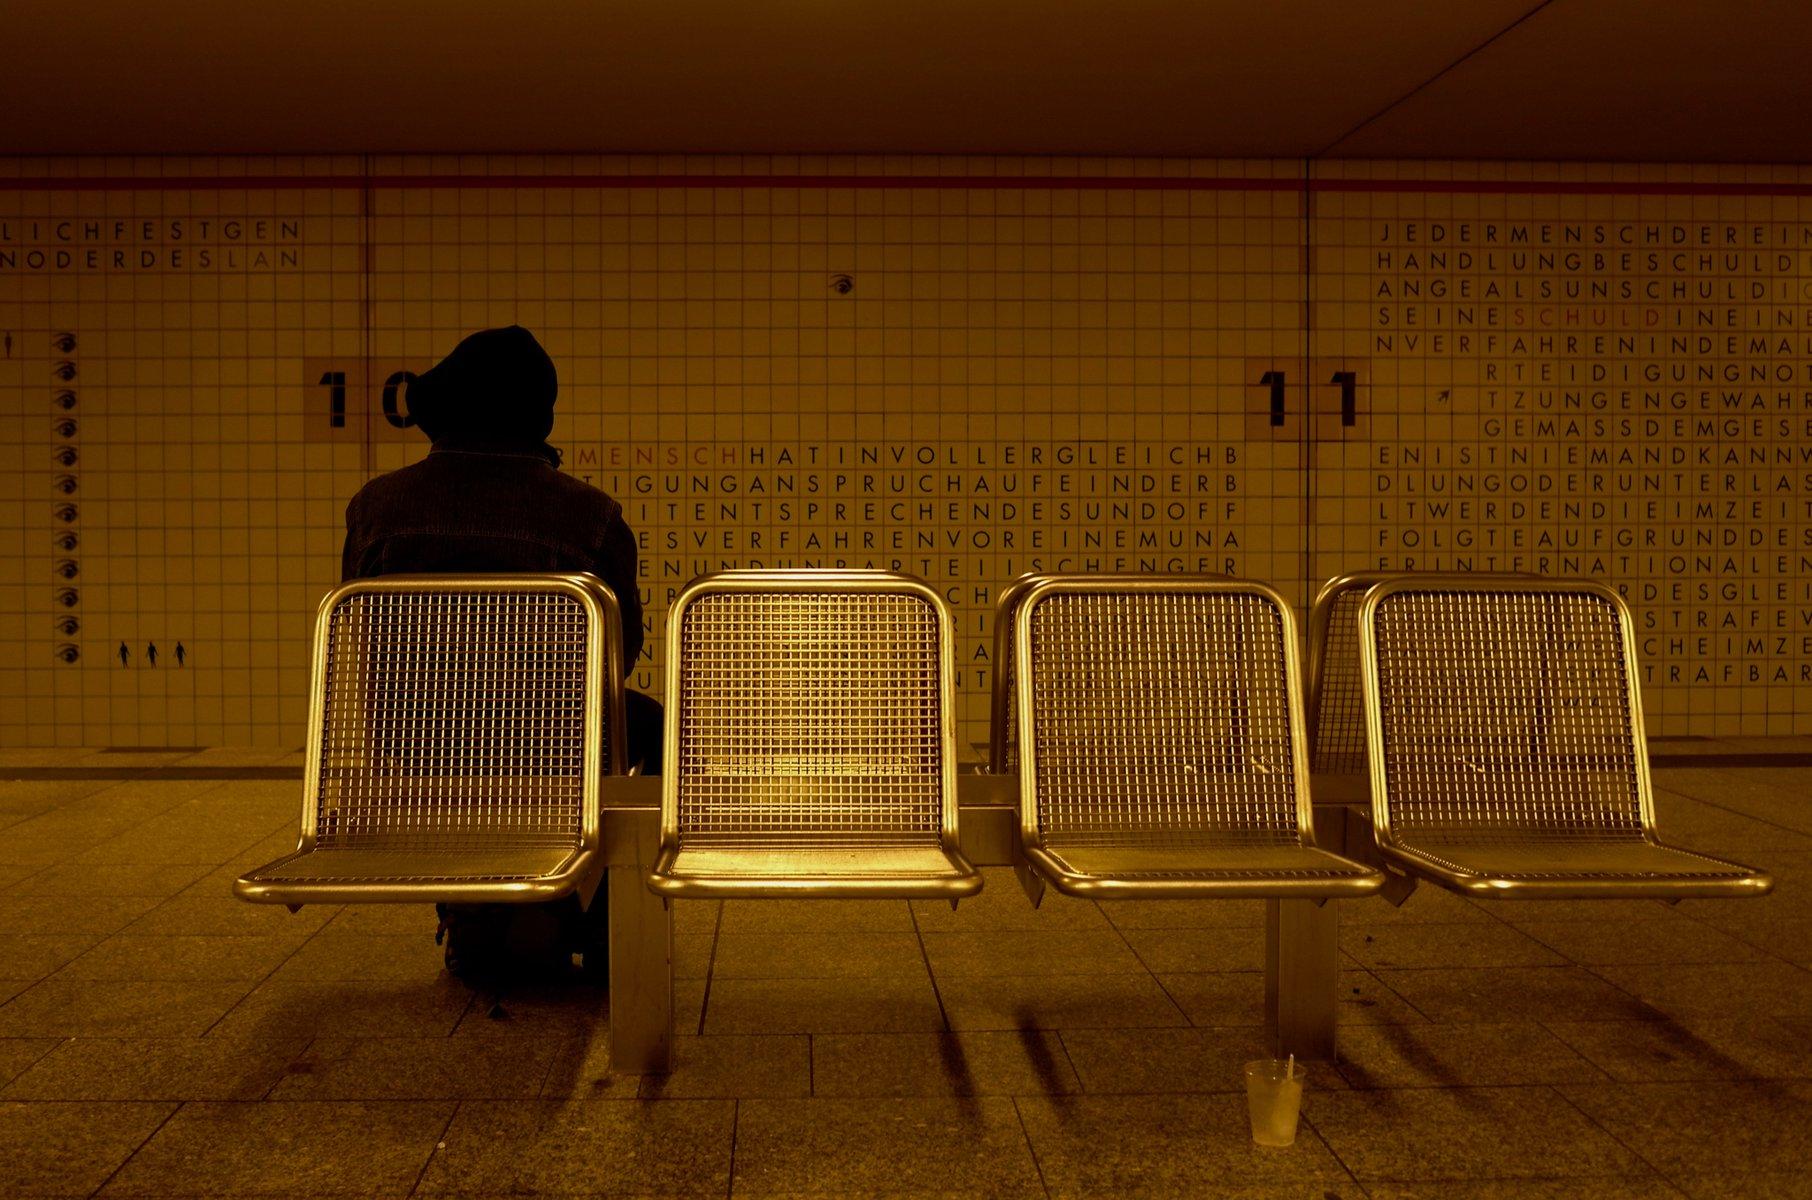 Jean-Pierre Damen urban and street photography - L1019559.jpg